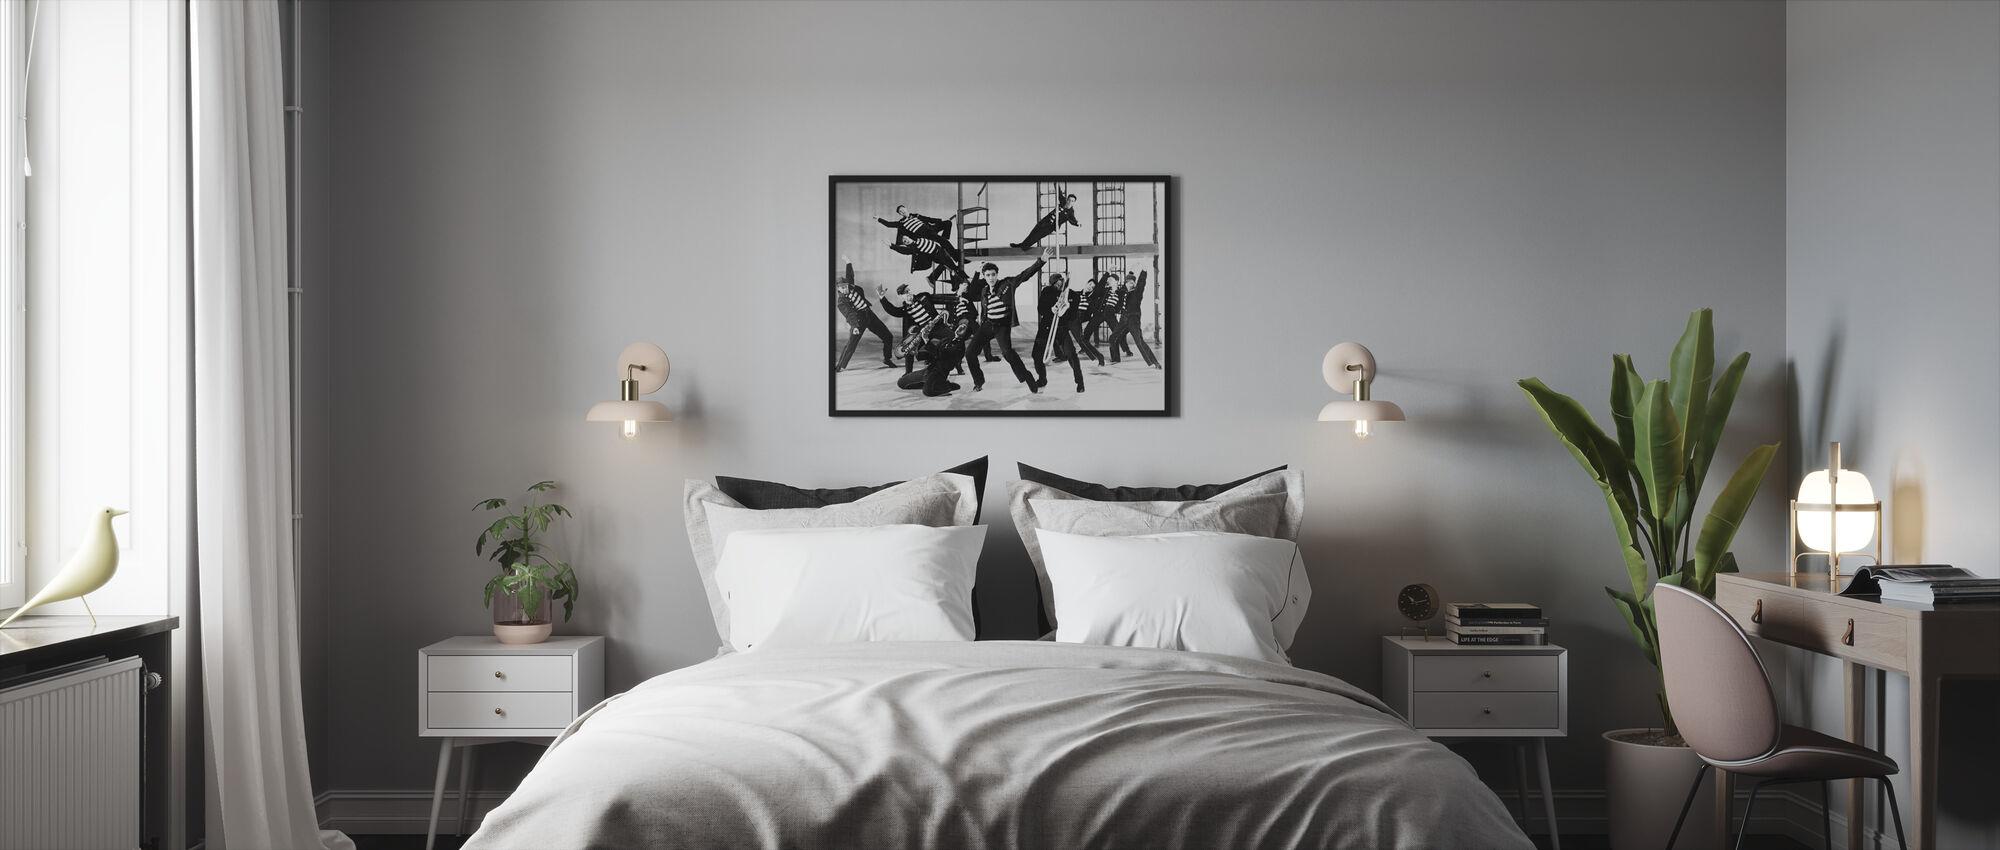 Jailhouse Rock - Elvis Presley - Framed print - Bedroom